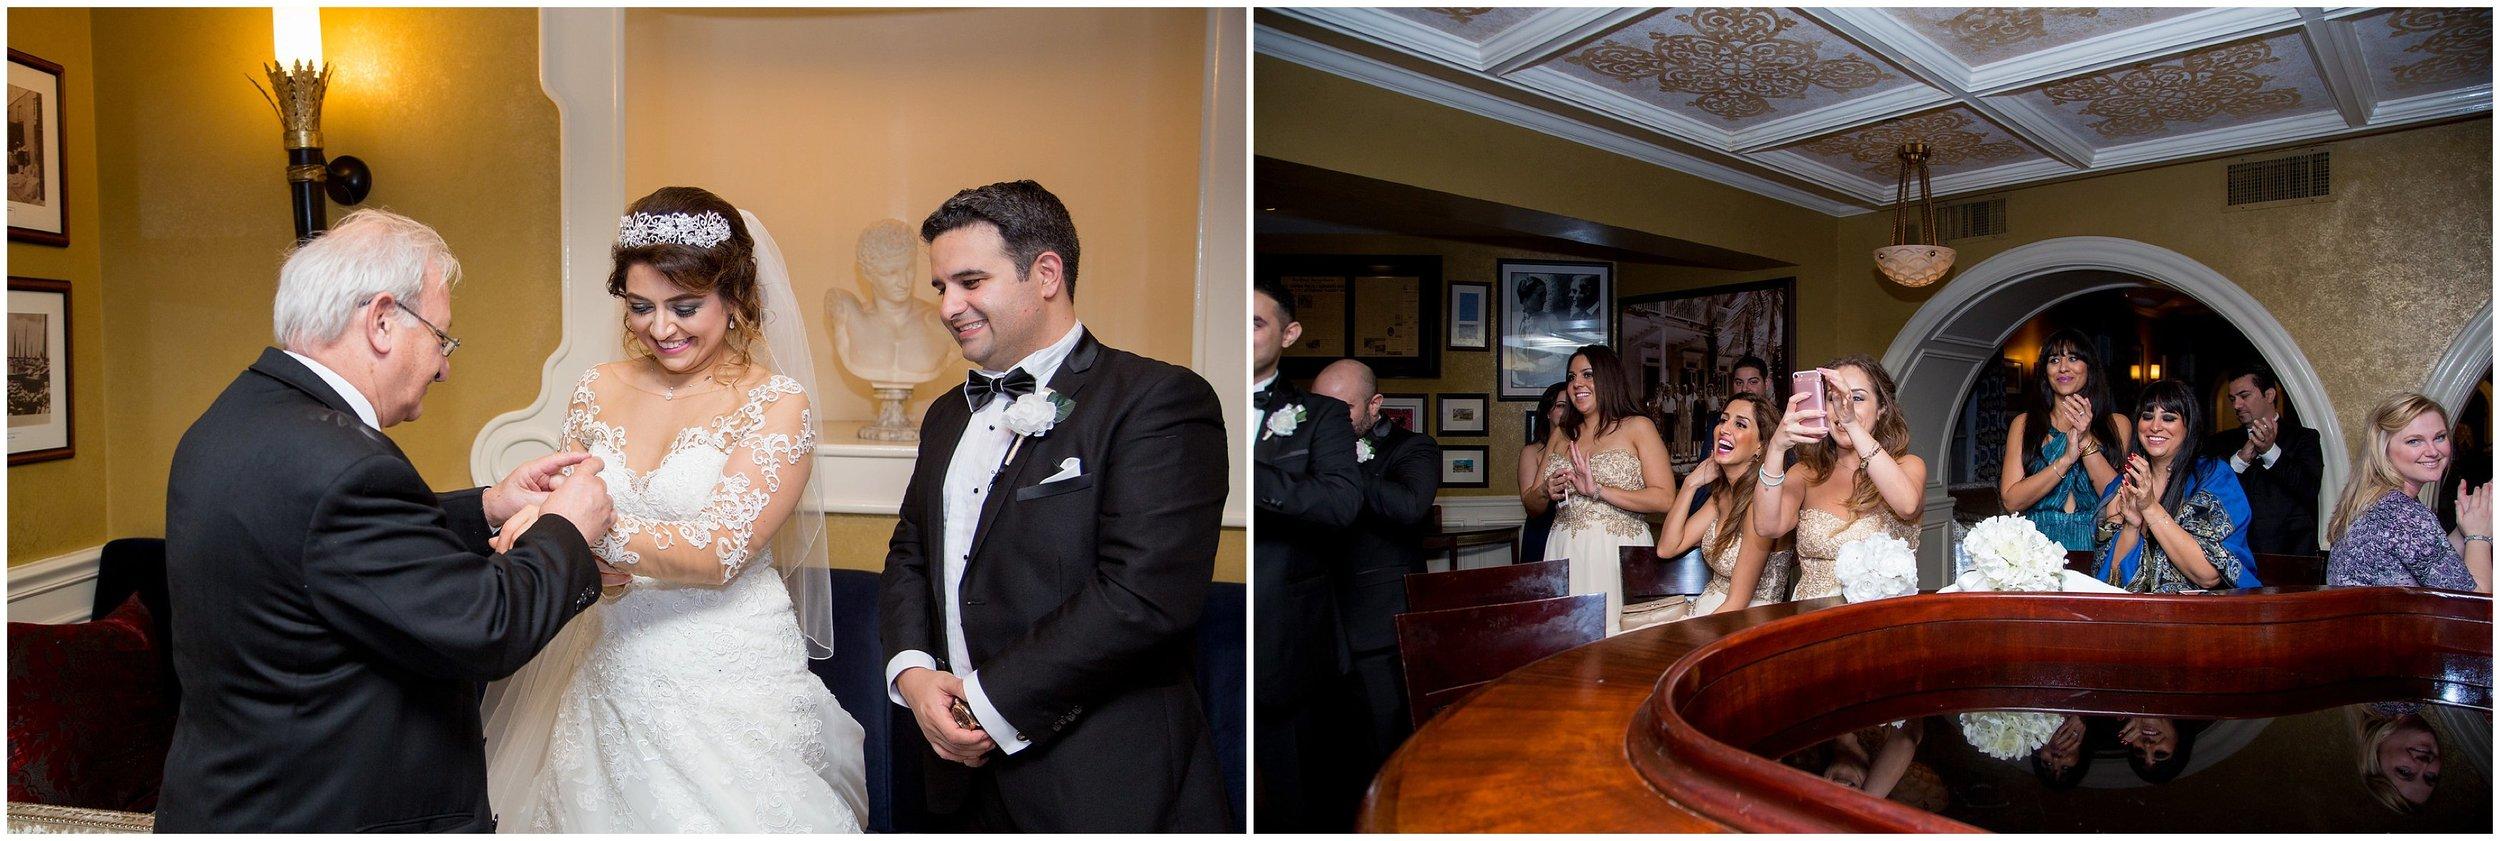 Le Cape Weddings- Destination Wedding Photography -ShayanandNikkie-466-X3_LuxuryDestinationPhotographer.jpg